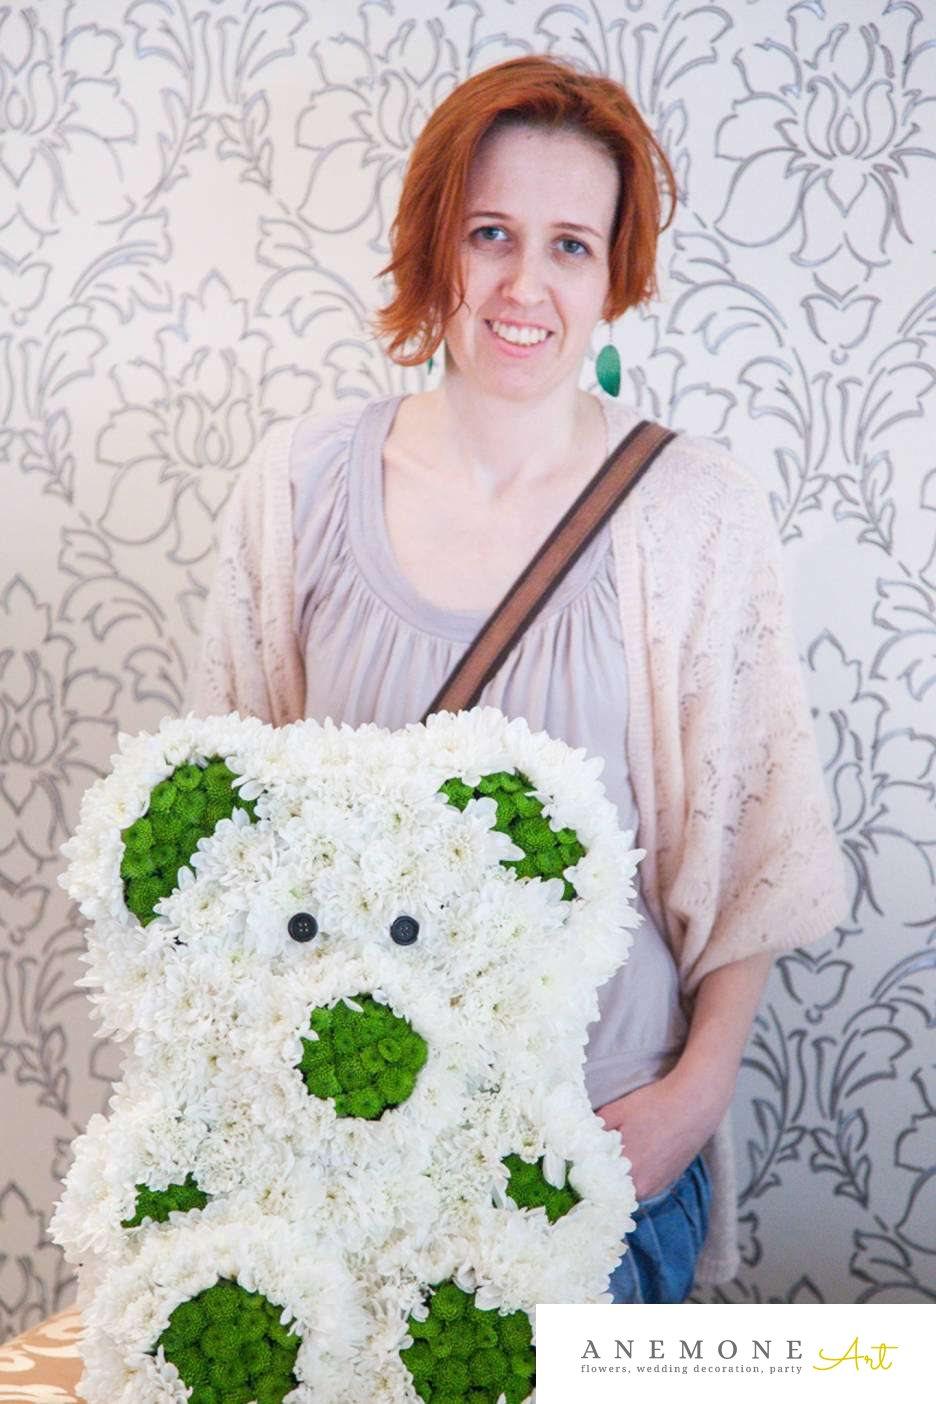 Poza, foto cu Flori de nunta alb, crizanteme, ursulet, verde in Arad, Timisoara, Oradea (wedding flowers, bouquets) nunta Arad, Timisoara, Oradea